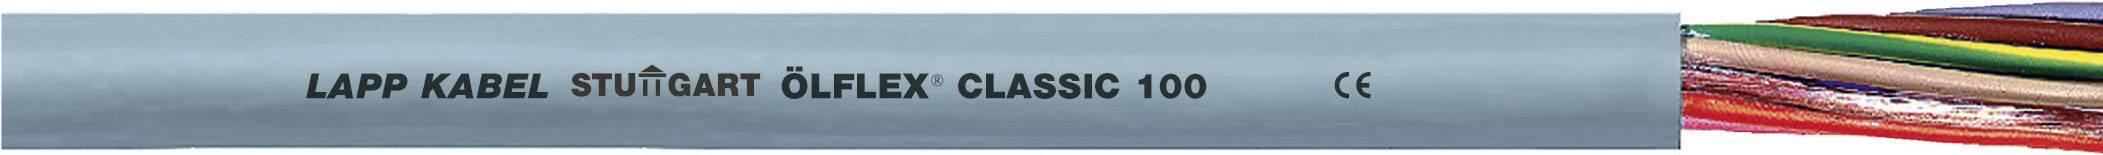 Kabel LappKabel Ölflex CLASSIC 100 40G0,5 (0010016), PVC, 15,4 mm, 500 V, šedá, 500 m